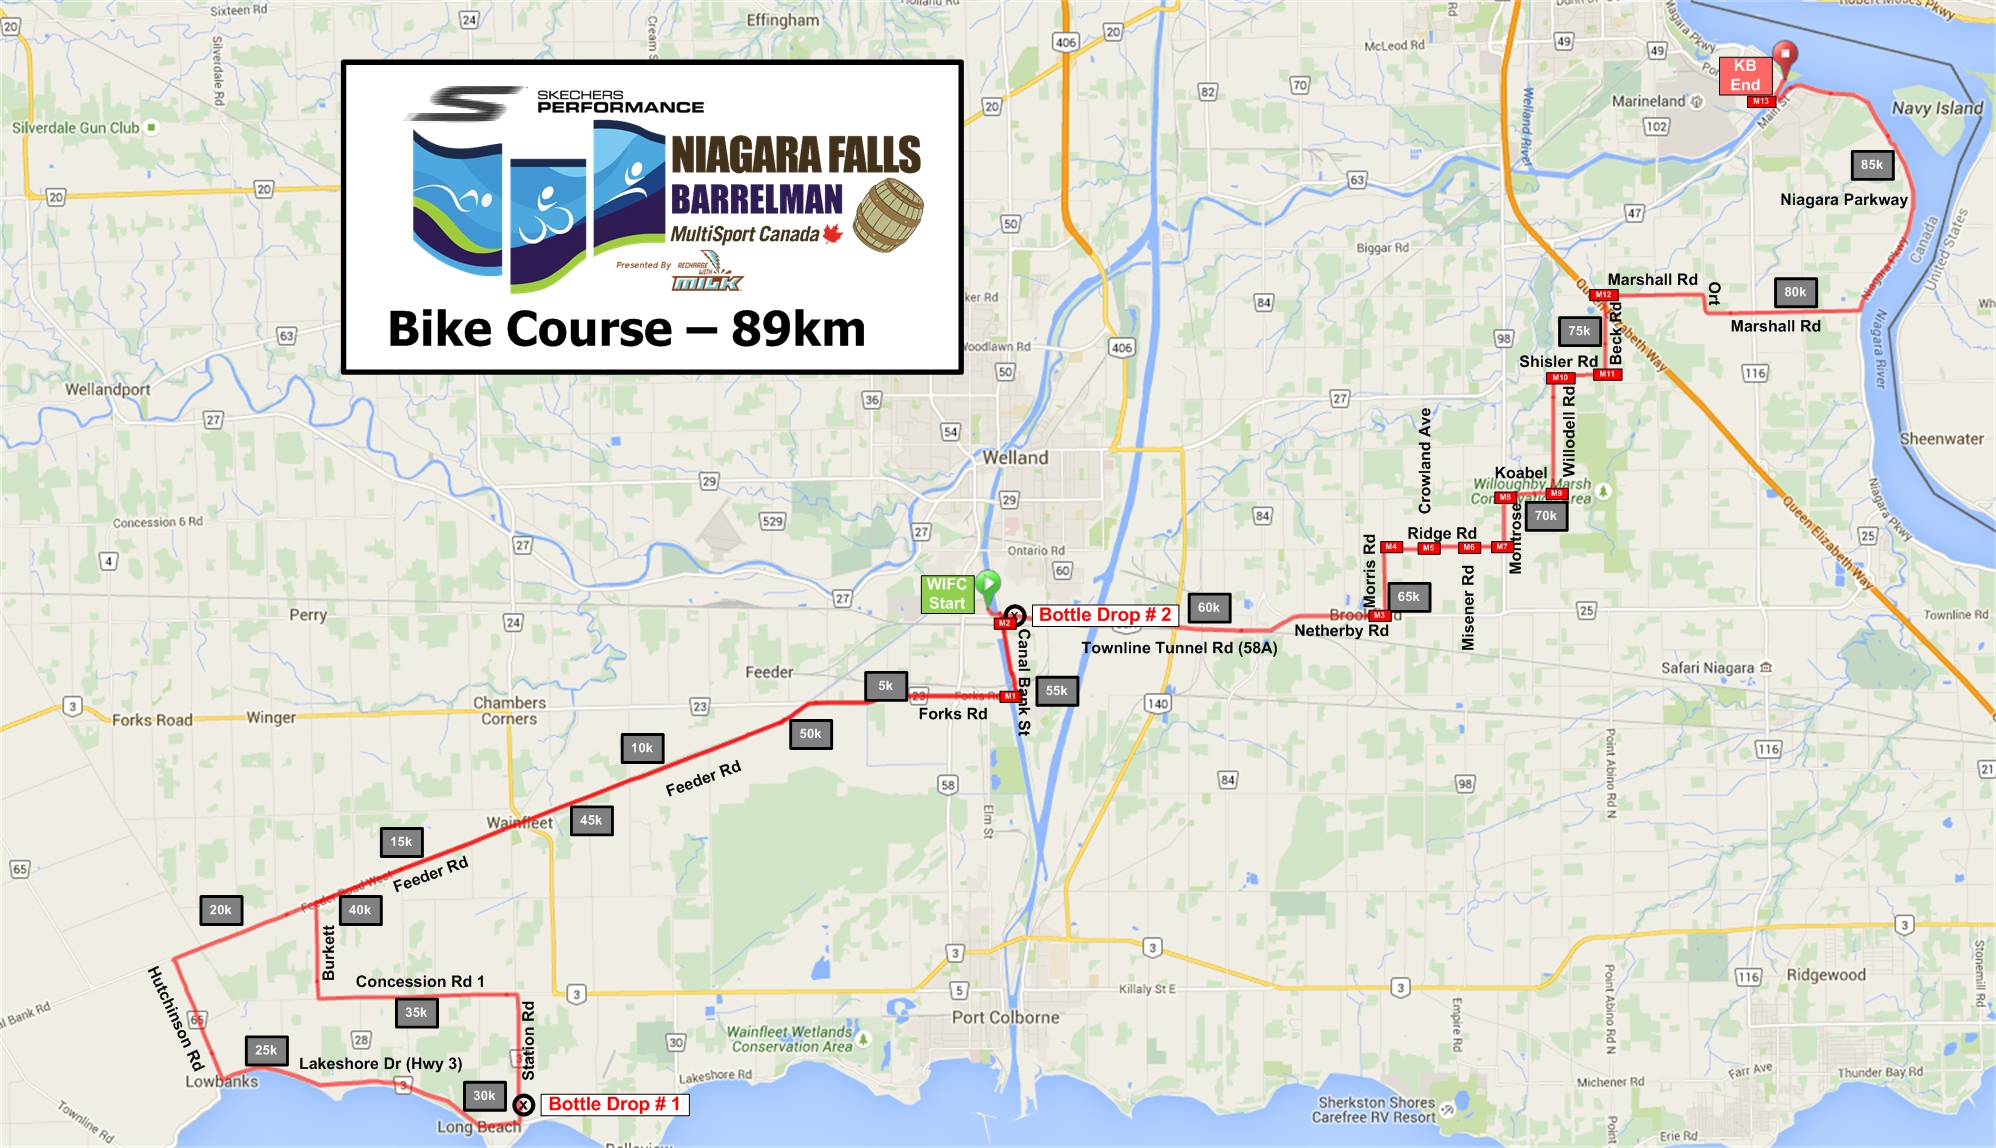 Course Details - Barrelman Niagara Falls